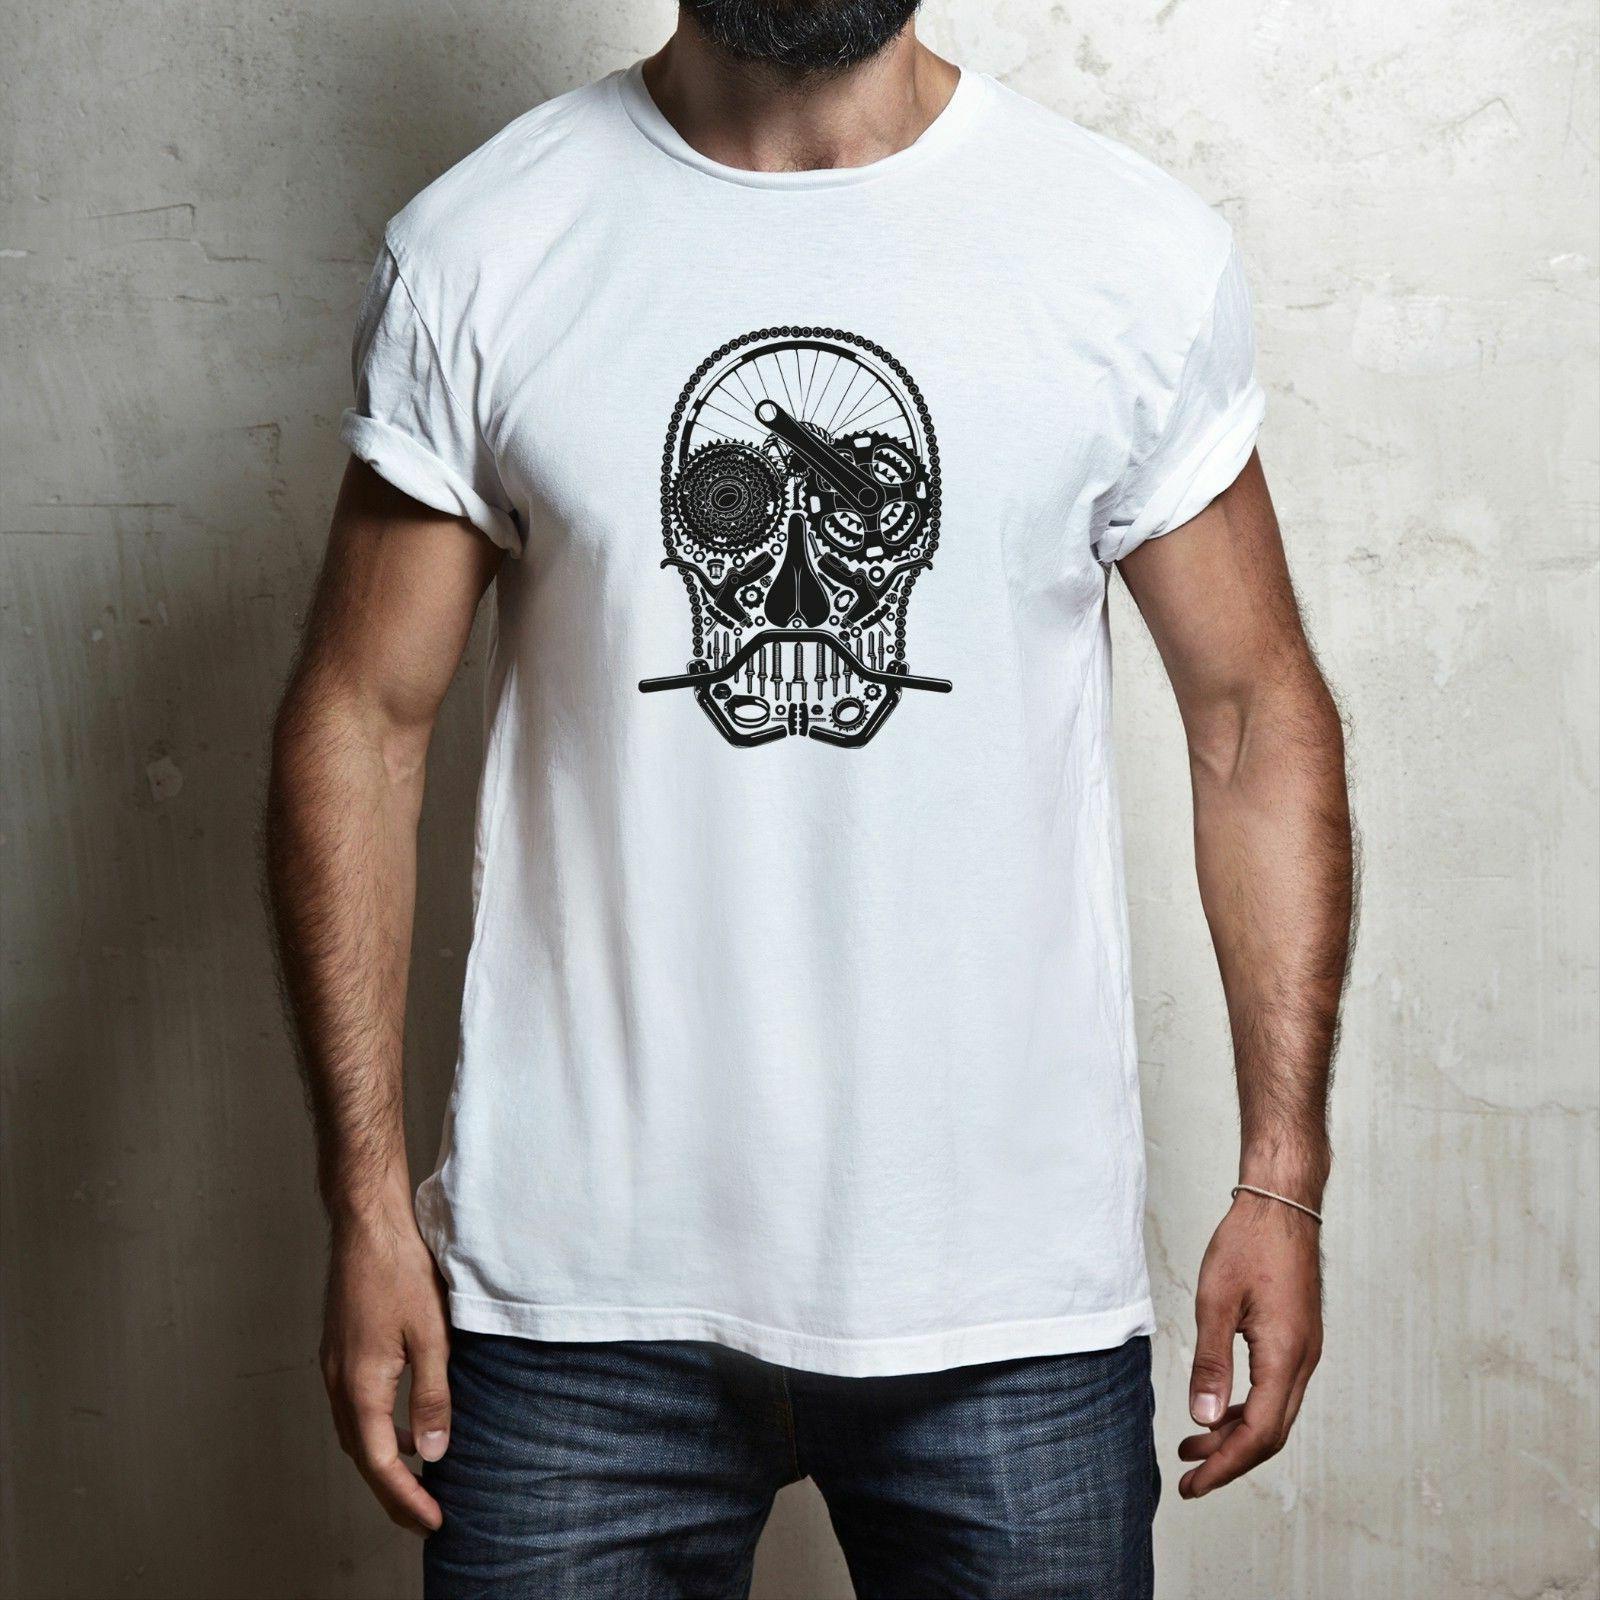 MOUNTAIN BIKE PARTS SKULL 100% cotton T-shirt TEE